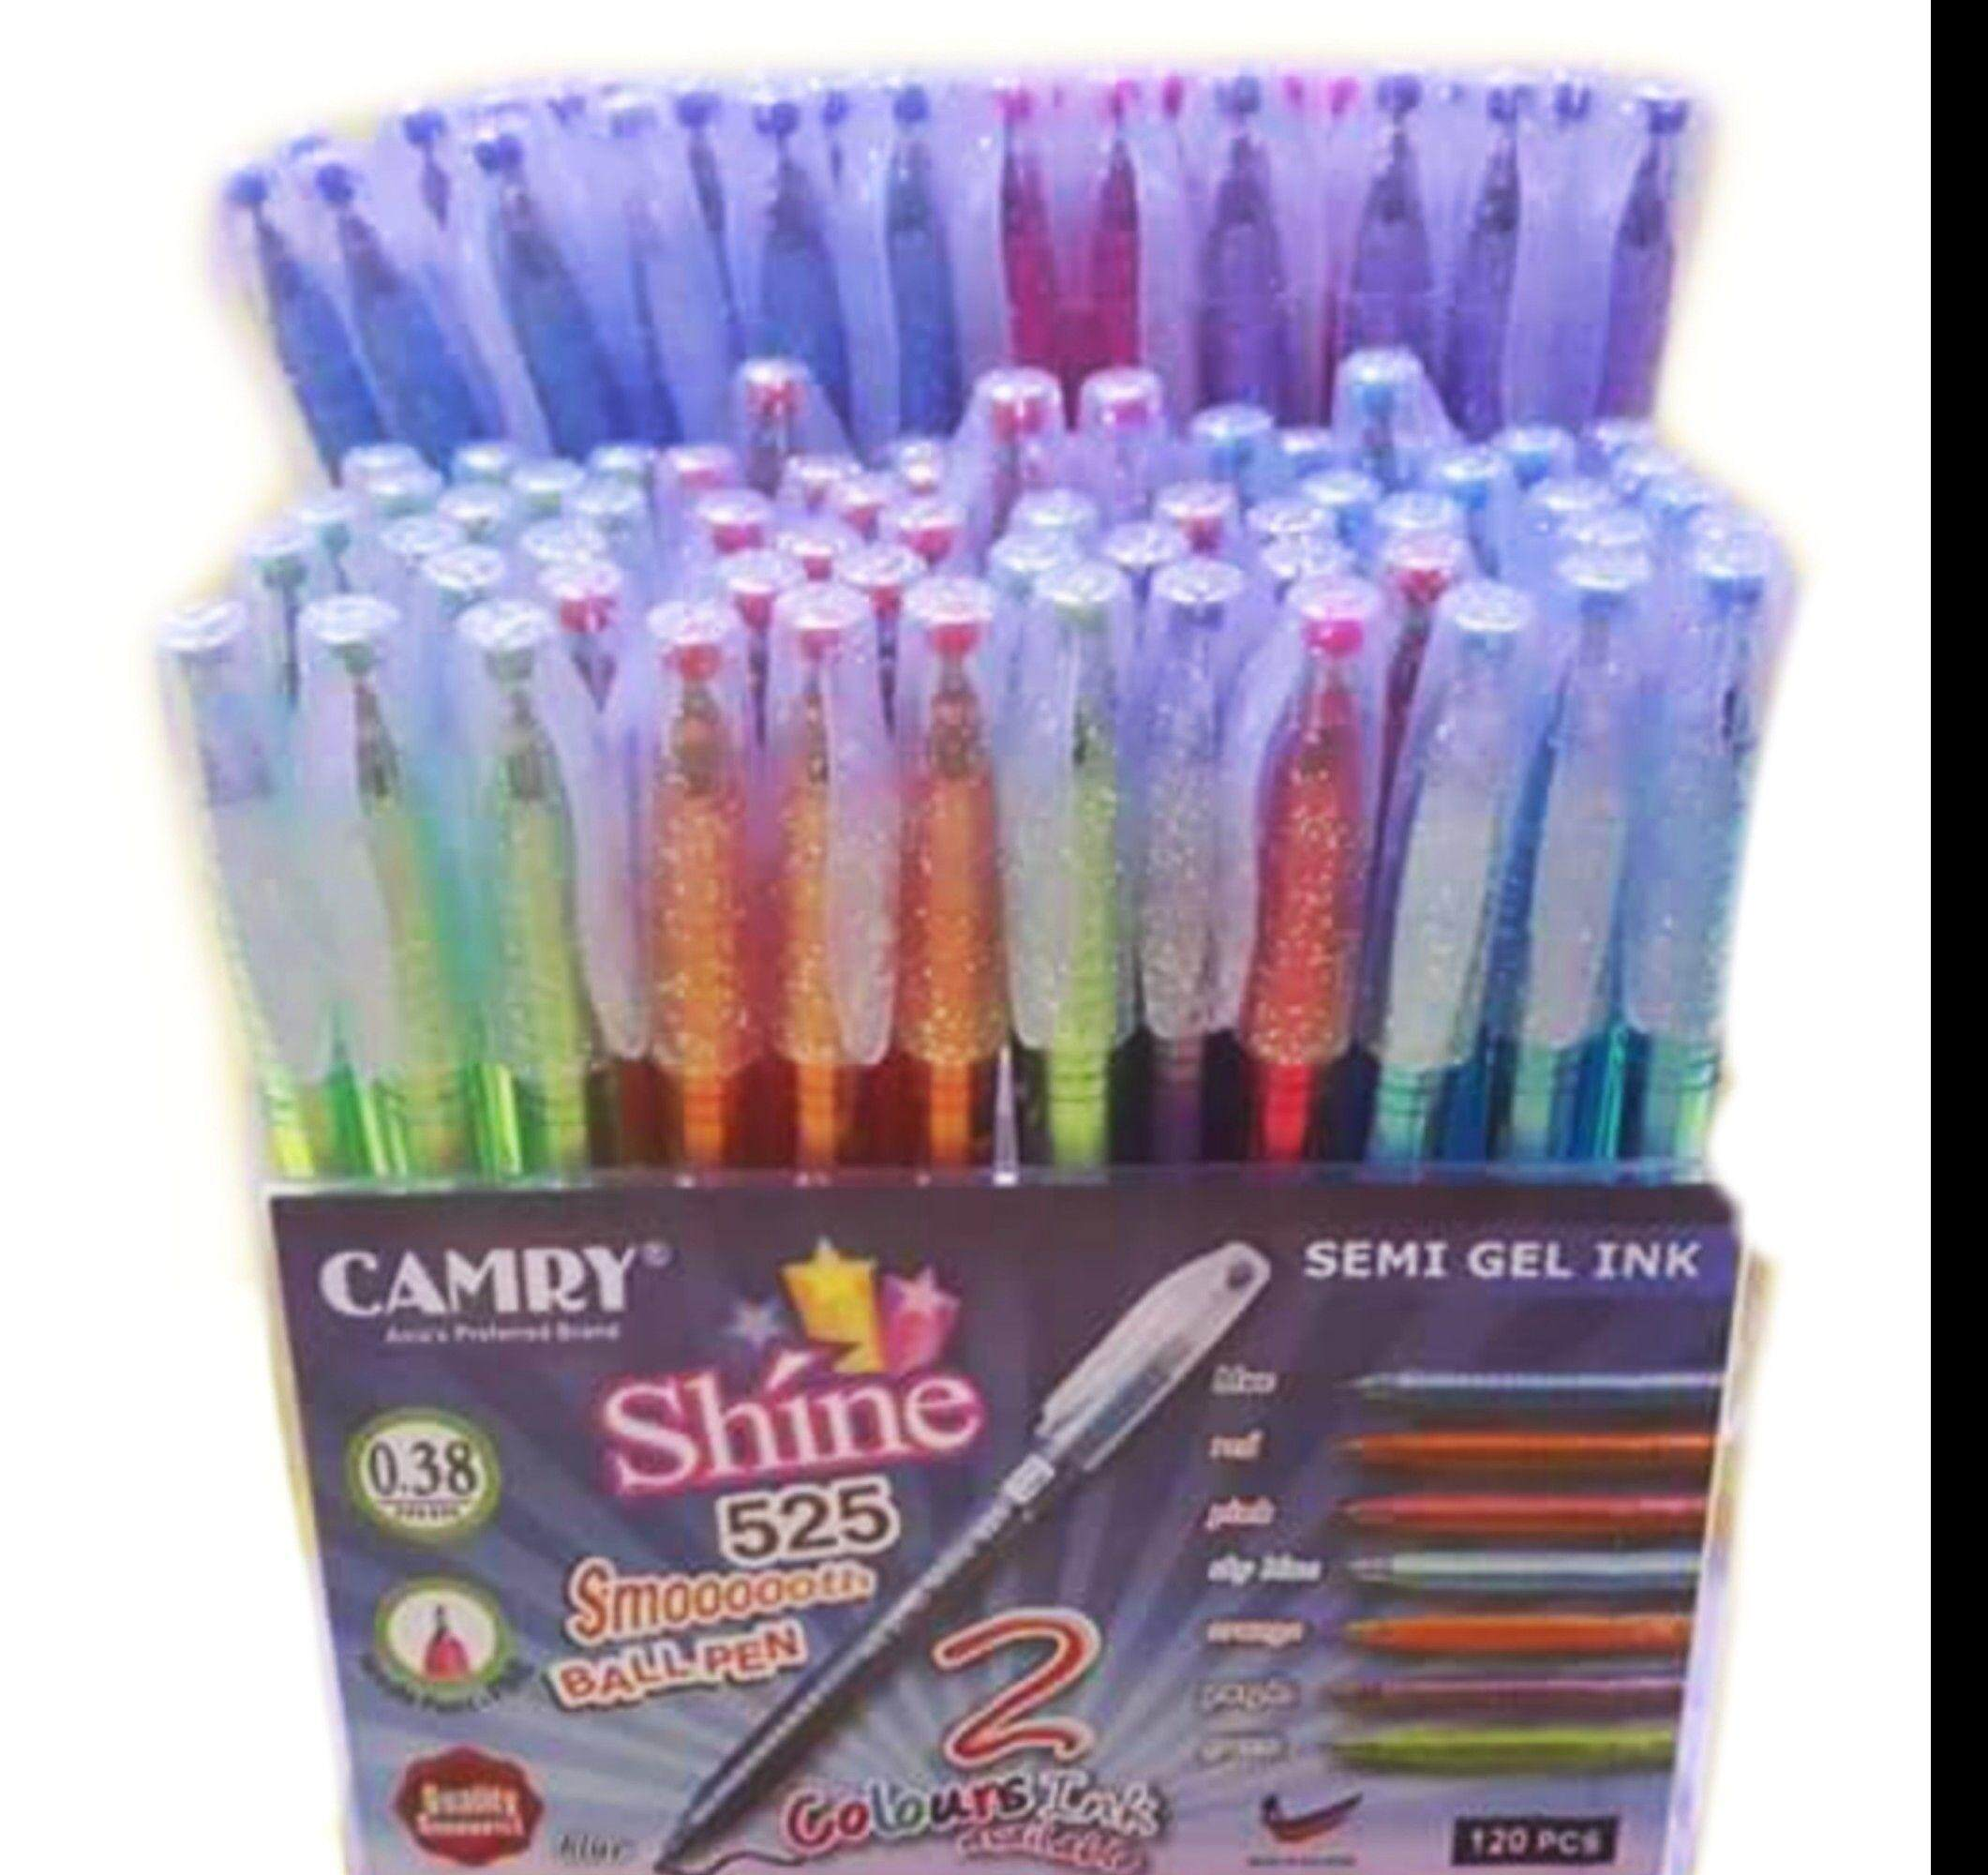 Camryปากกาลูกลื่นแคมรี่ ปากกาแคมรี่ Shine 525 สีน้ำเงิน สีแดง.